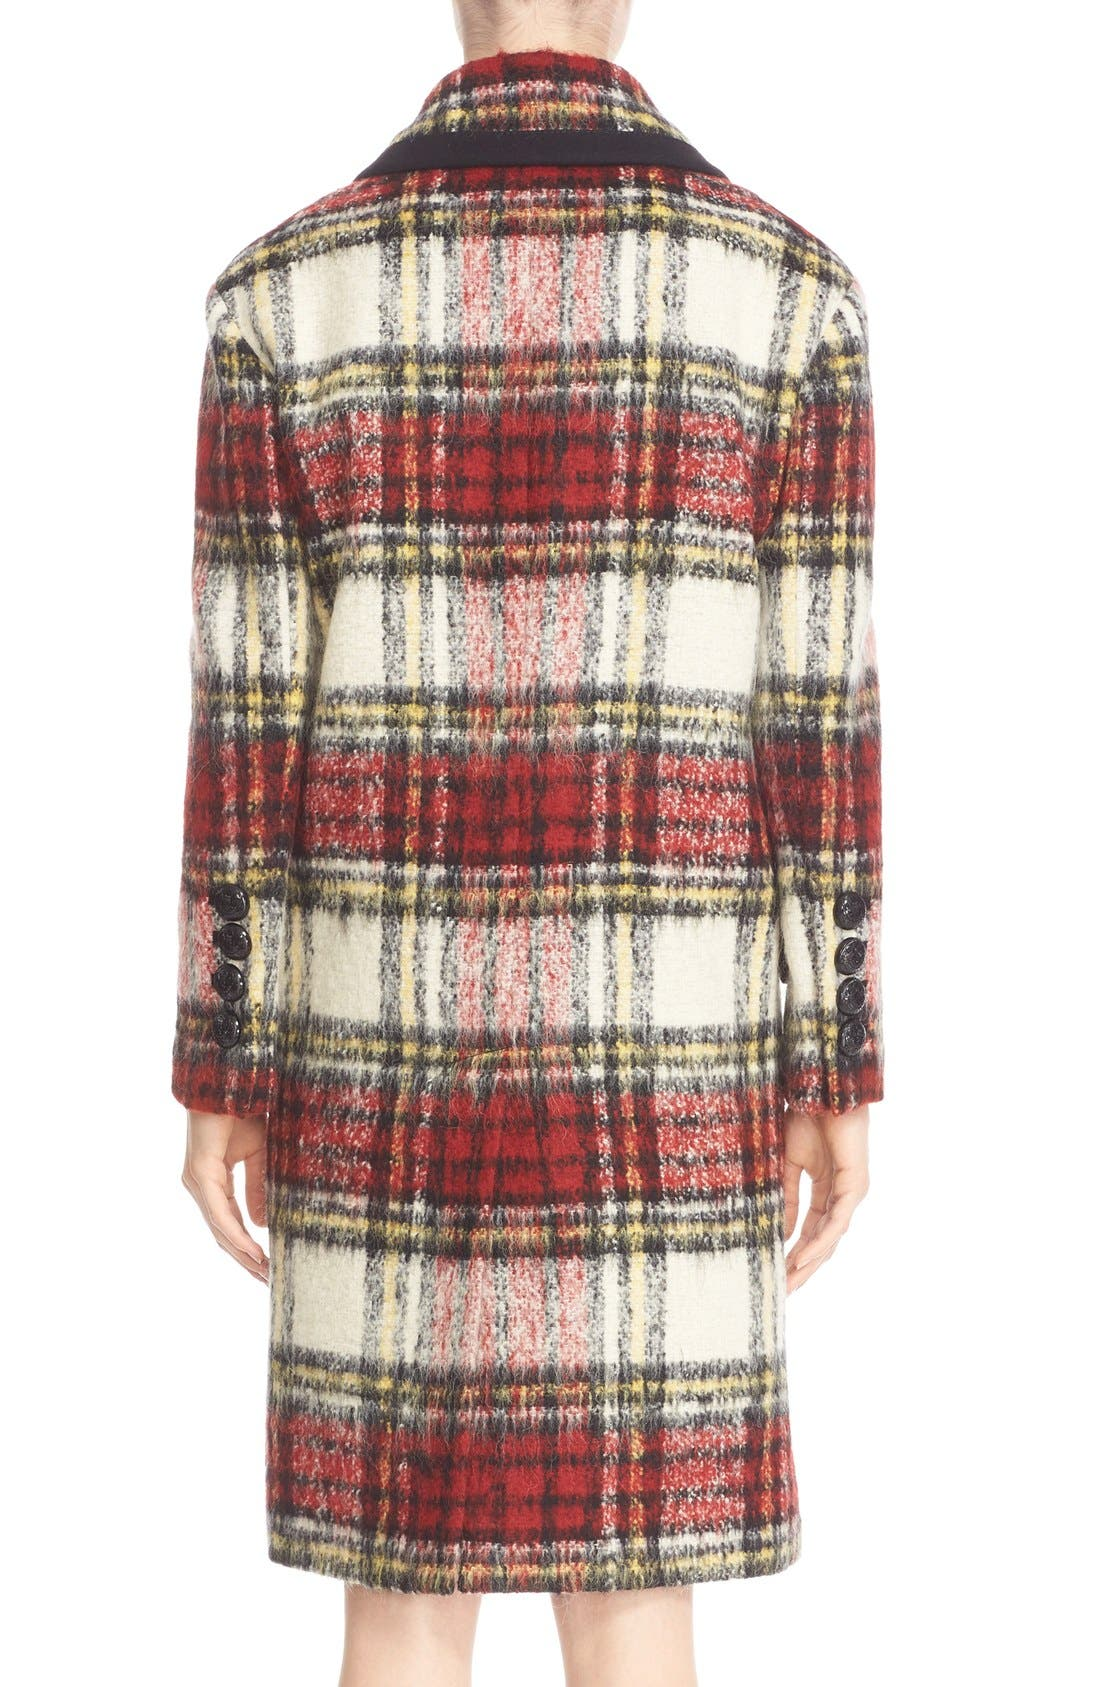 BURBERRY PRORSUM,                             Tartan Plaid Wool Blend Coat,                             Alternate thumbnail 2, color,                             930